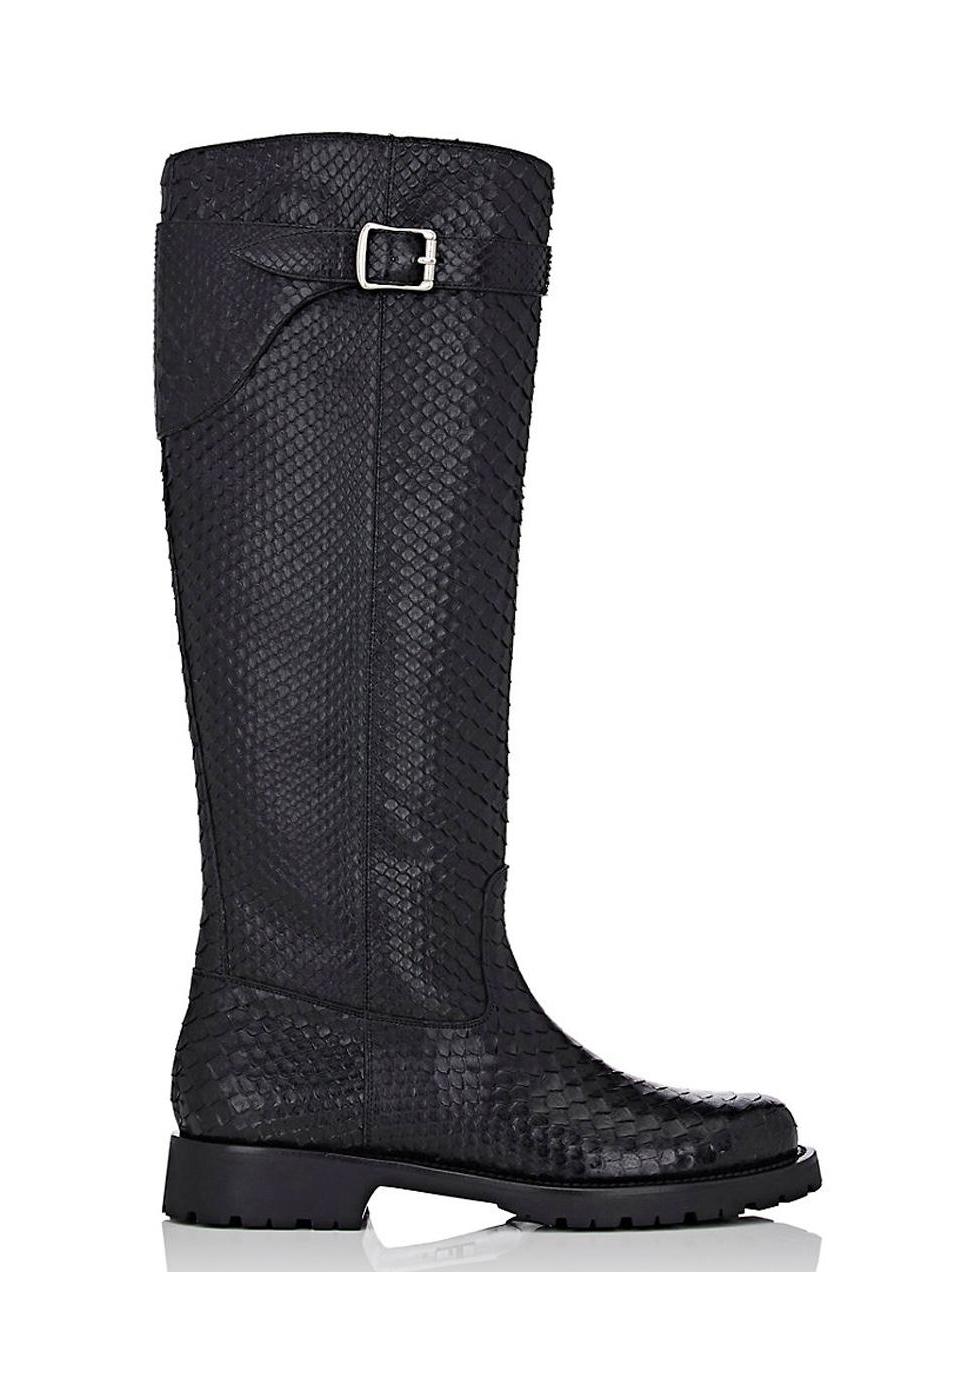 3c984d4e775a Saint Laurent knee high boots in black Python skin - Italian Boutique